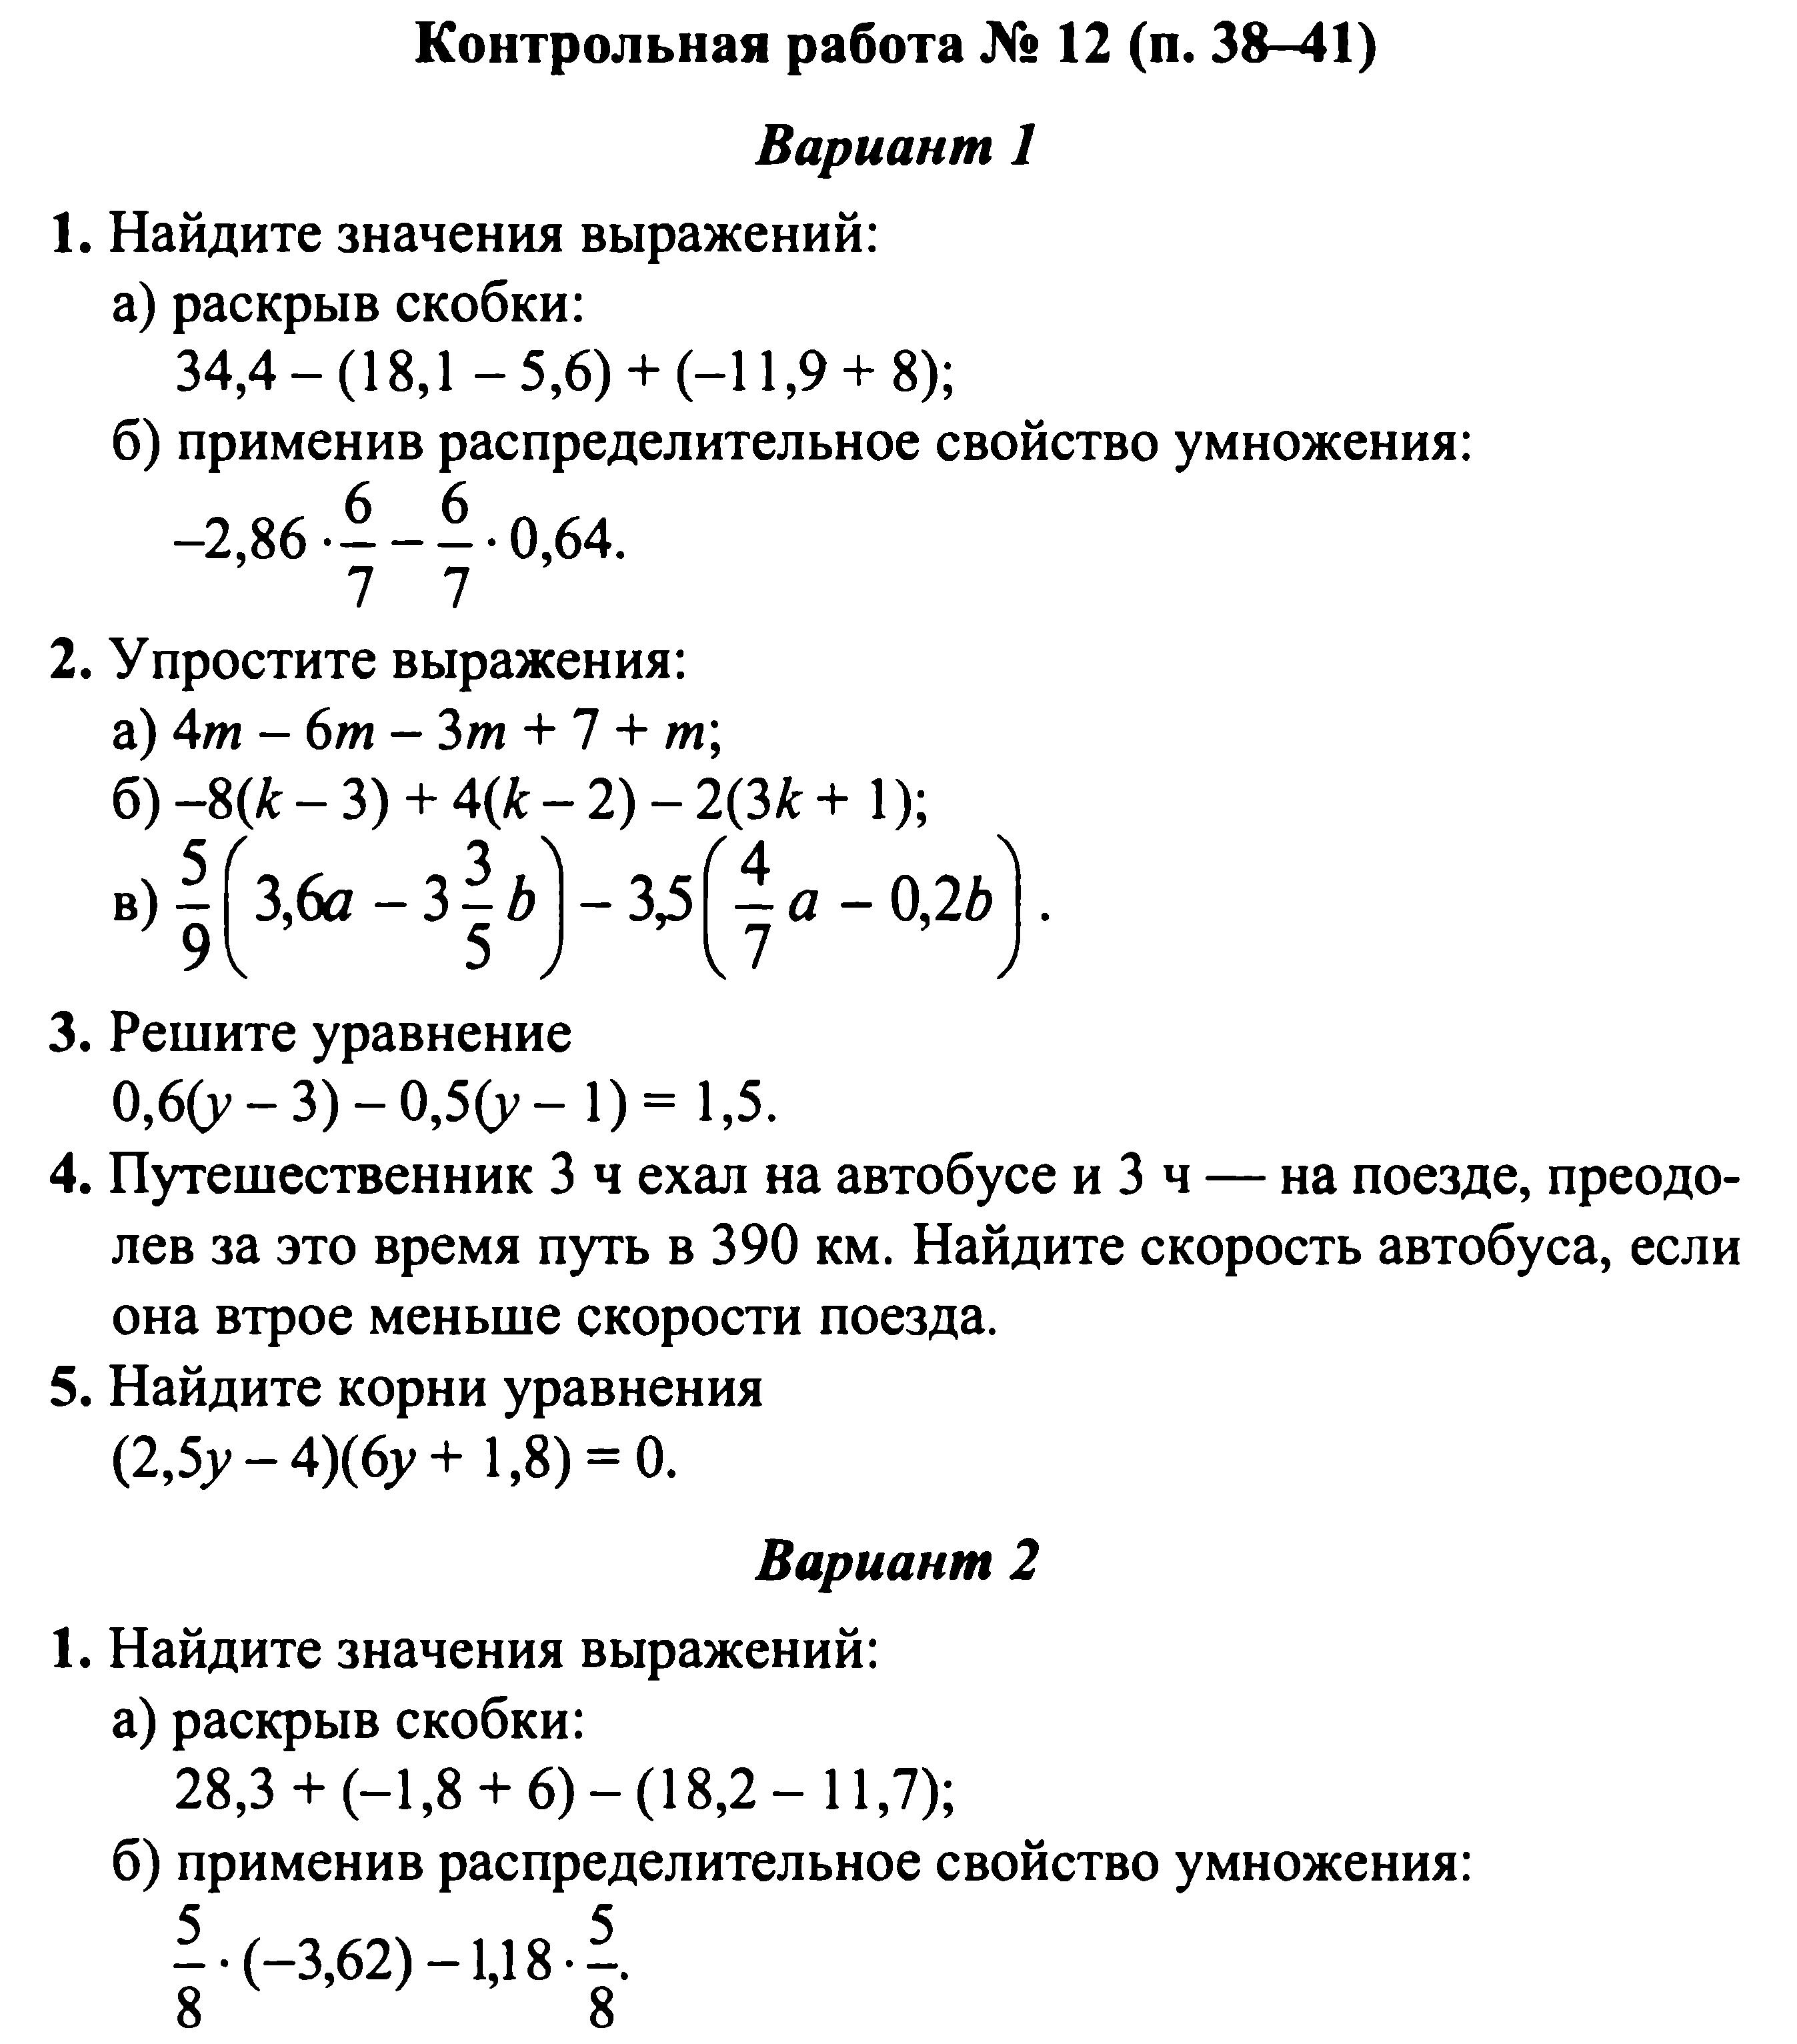 Рабочая программа по математике класс hello html 3e759d43 png